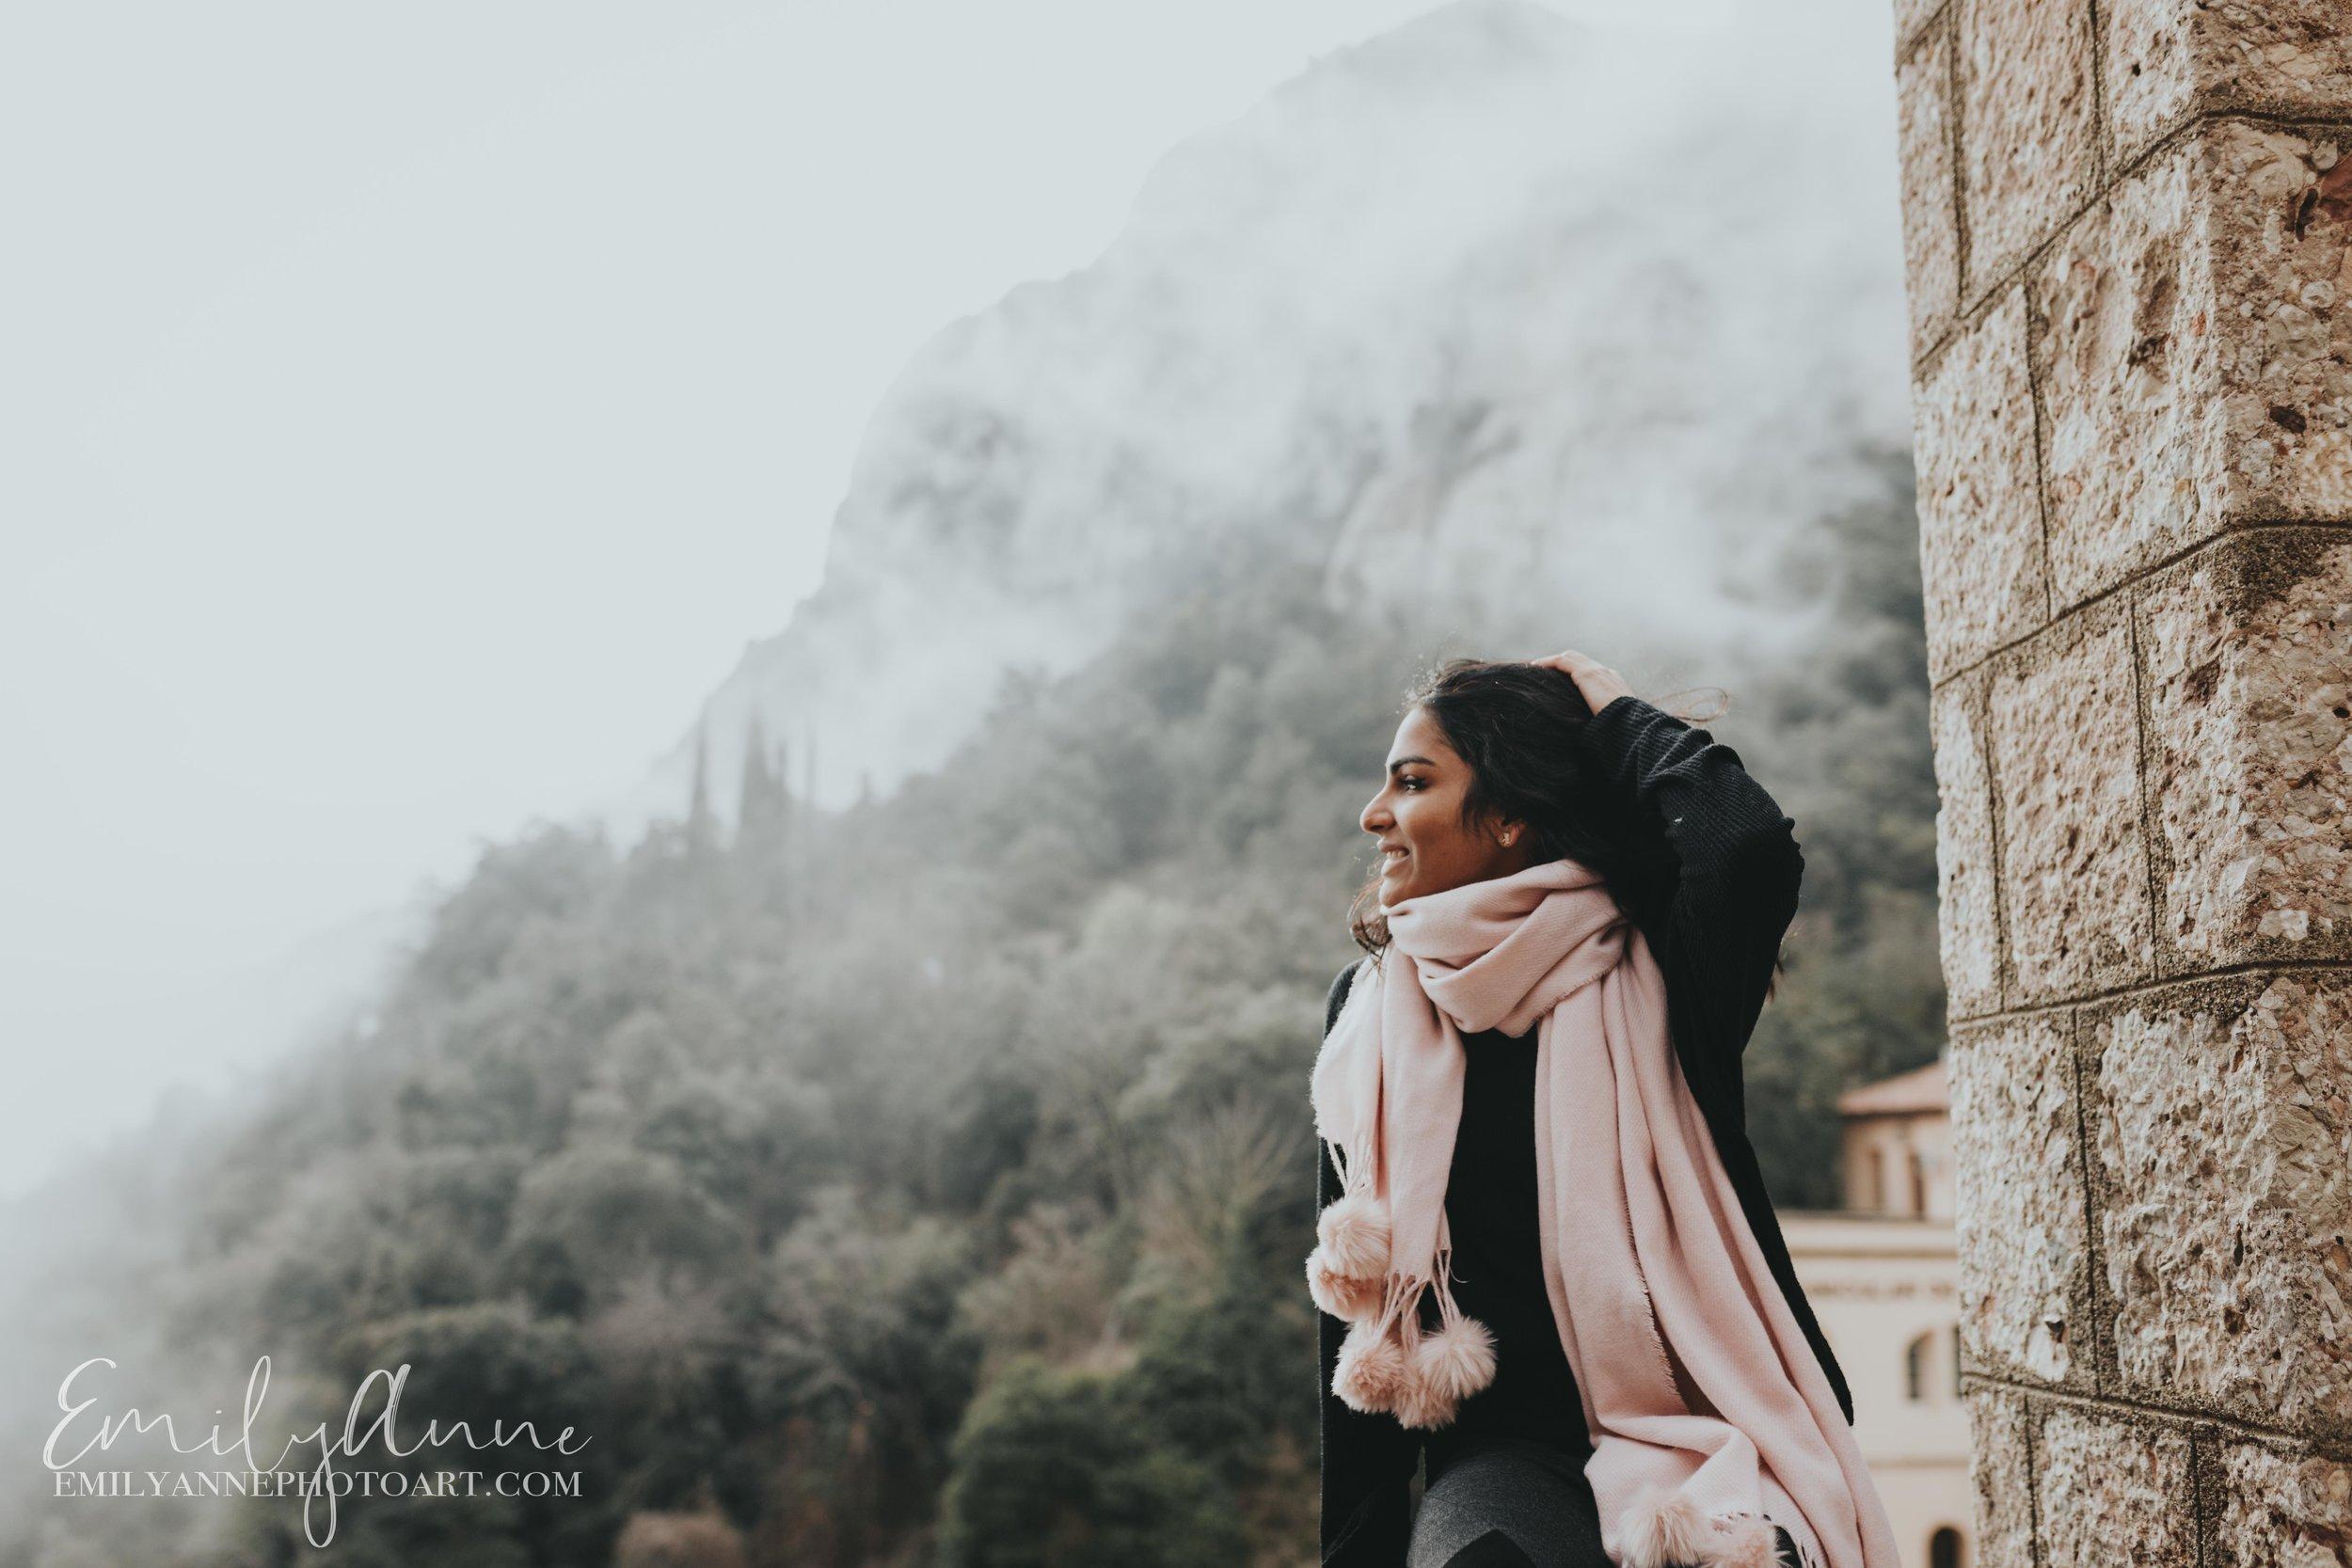 top portrait photographer fotografa Vanderbilt Nashville Barcelona Montserrat rocky peaks